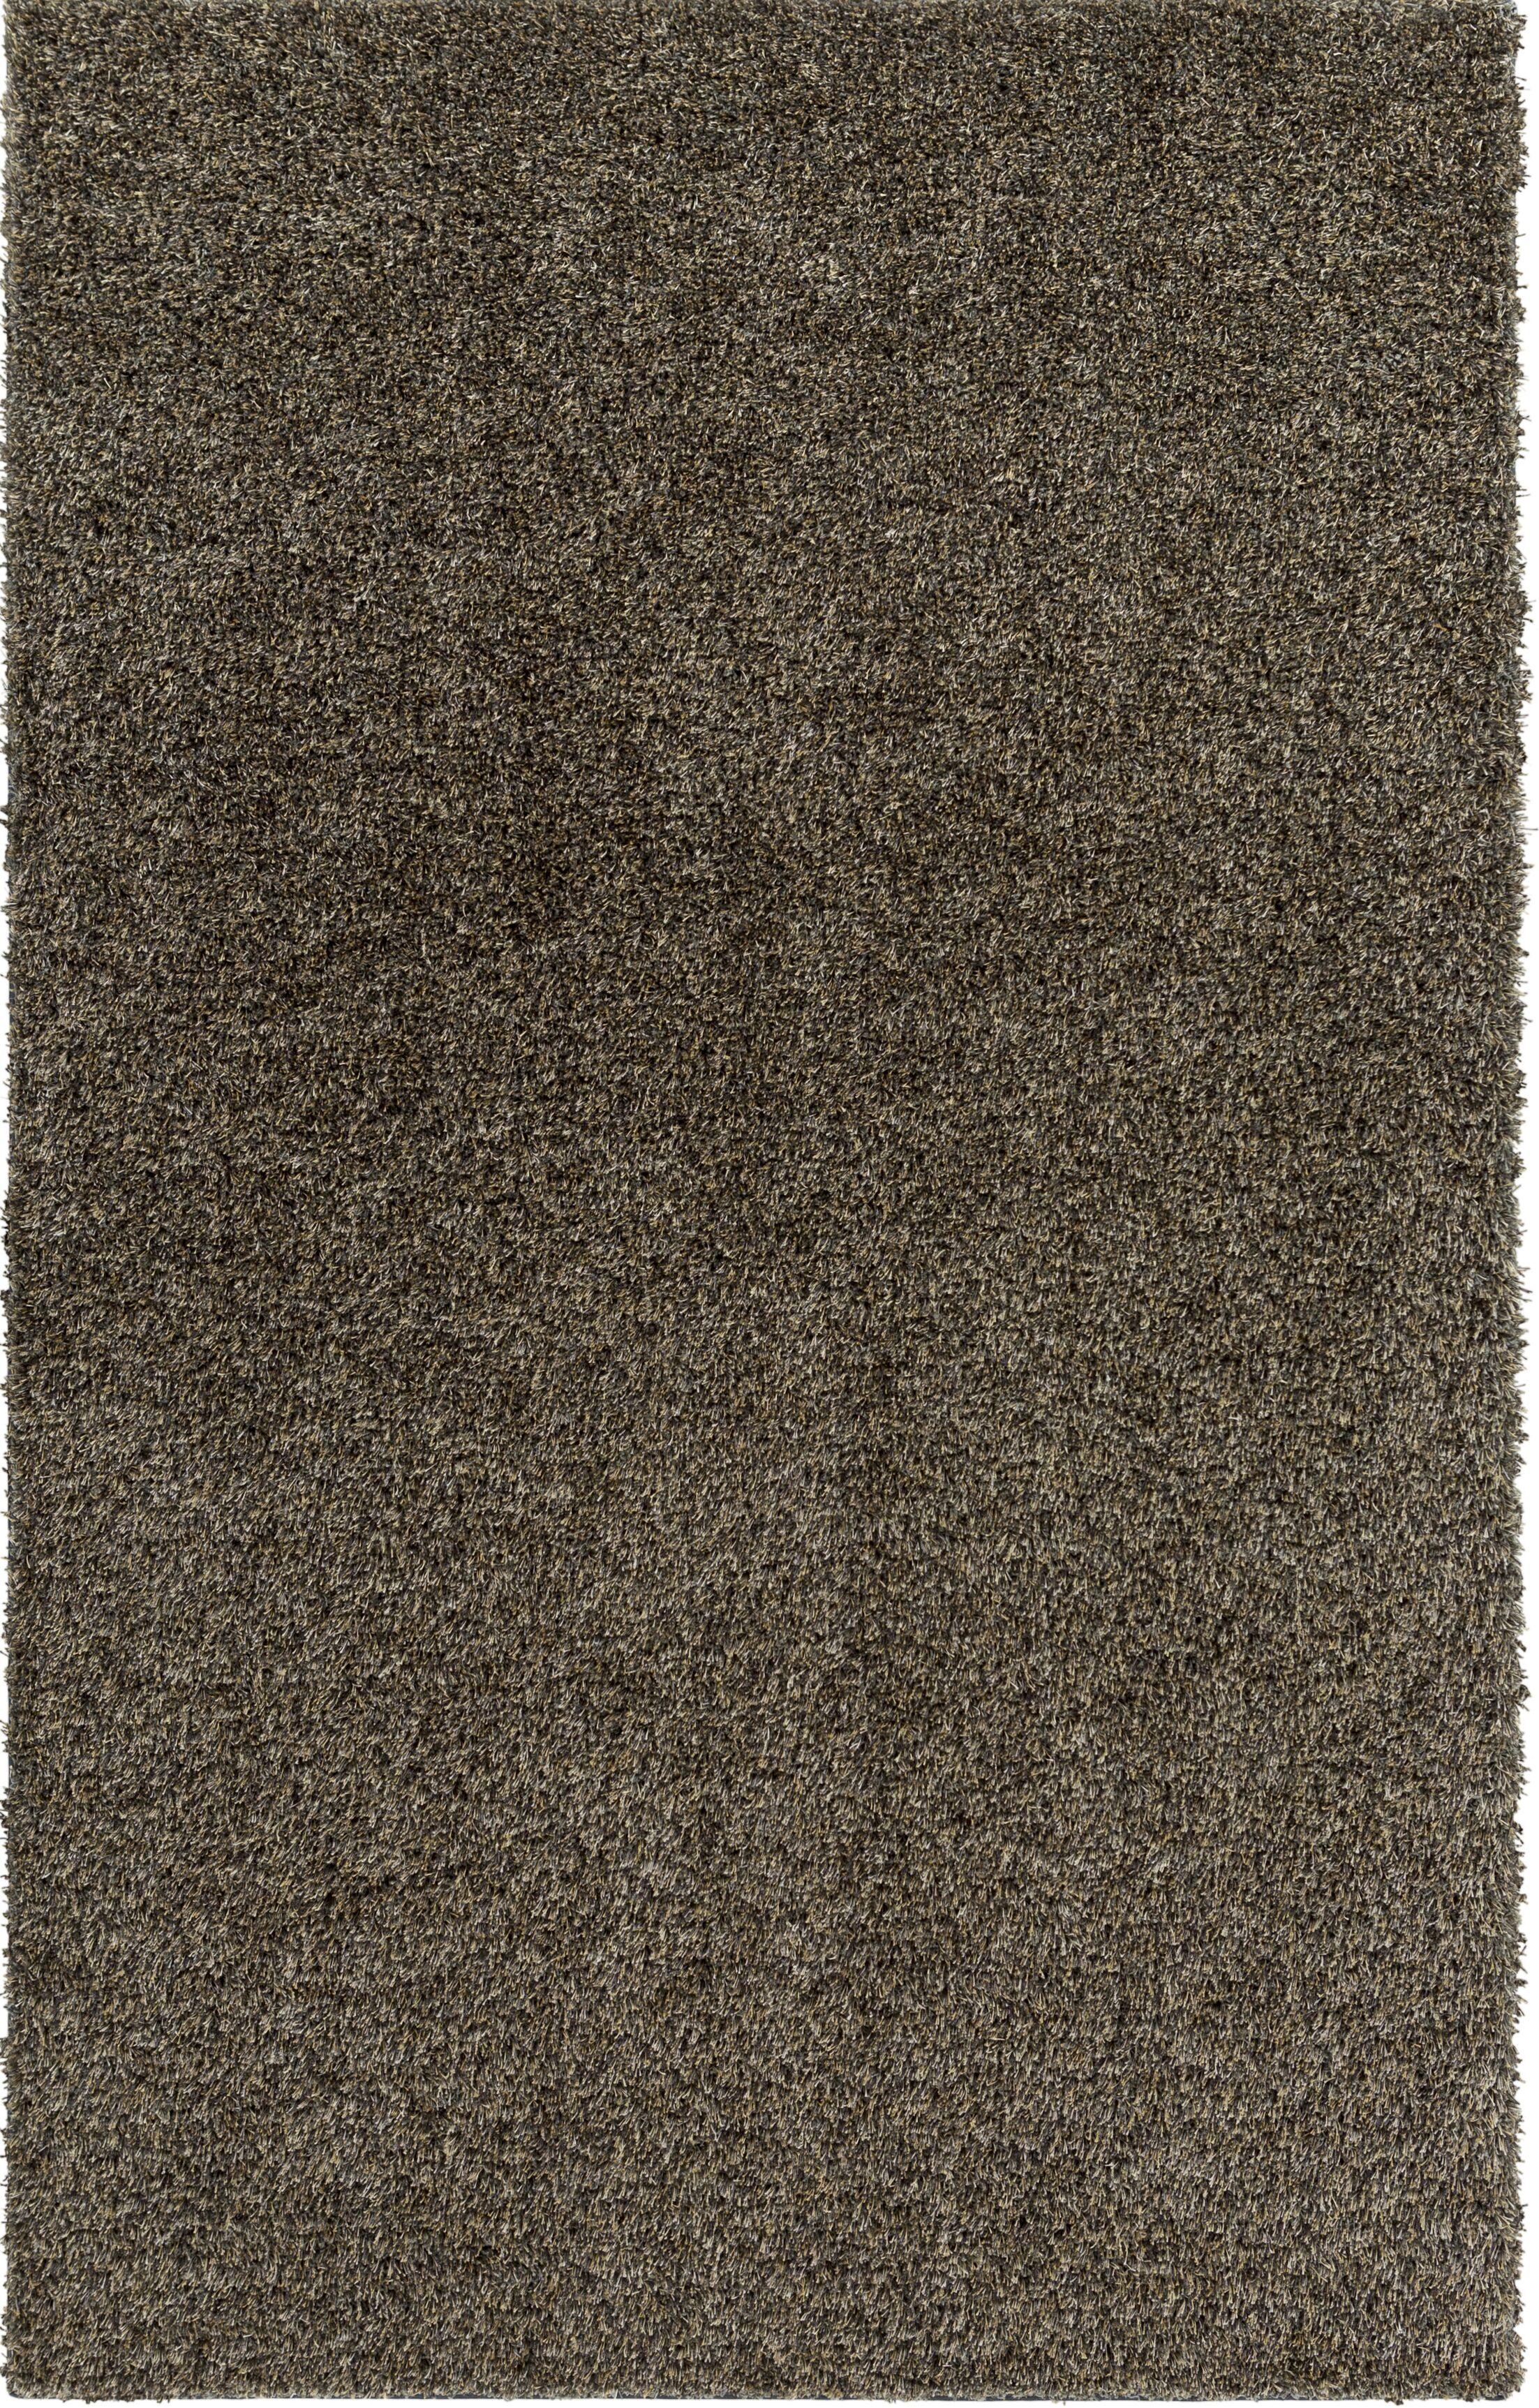 Dulcia Gray Area Rug Rug Size: Rectangle 9' x 13'